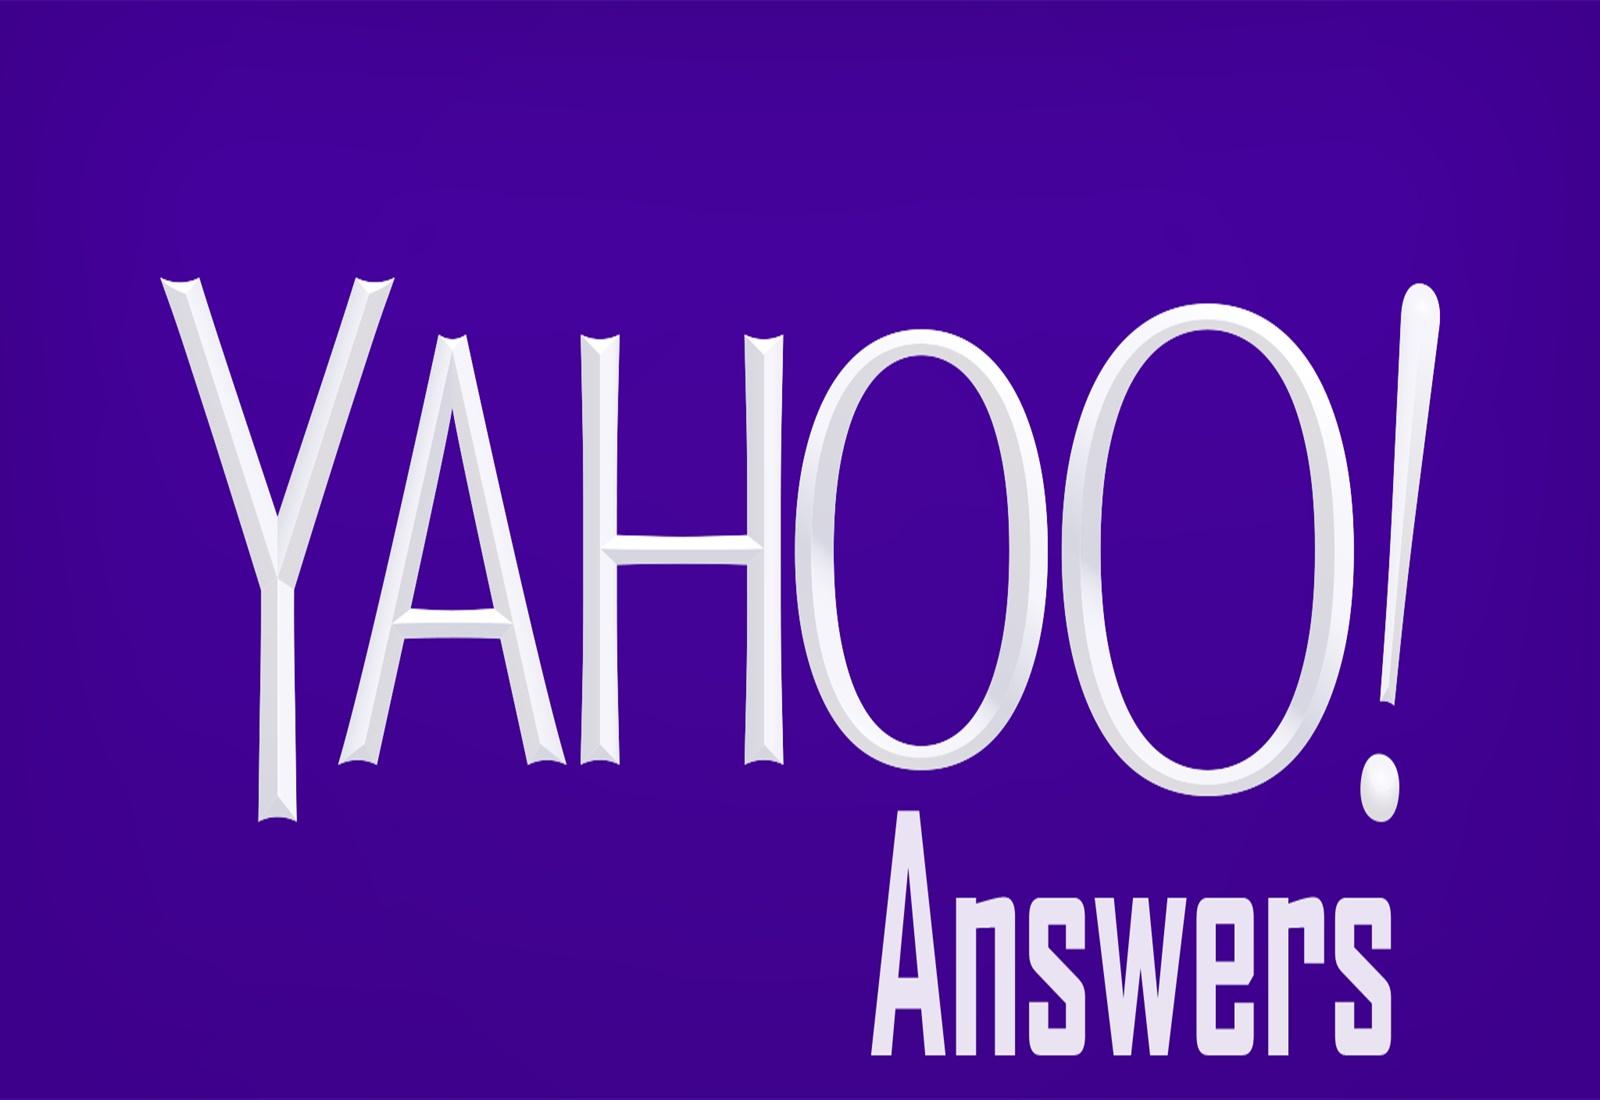 Provide 1 Yahoo Answers level 3 account